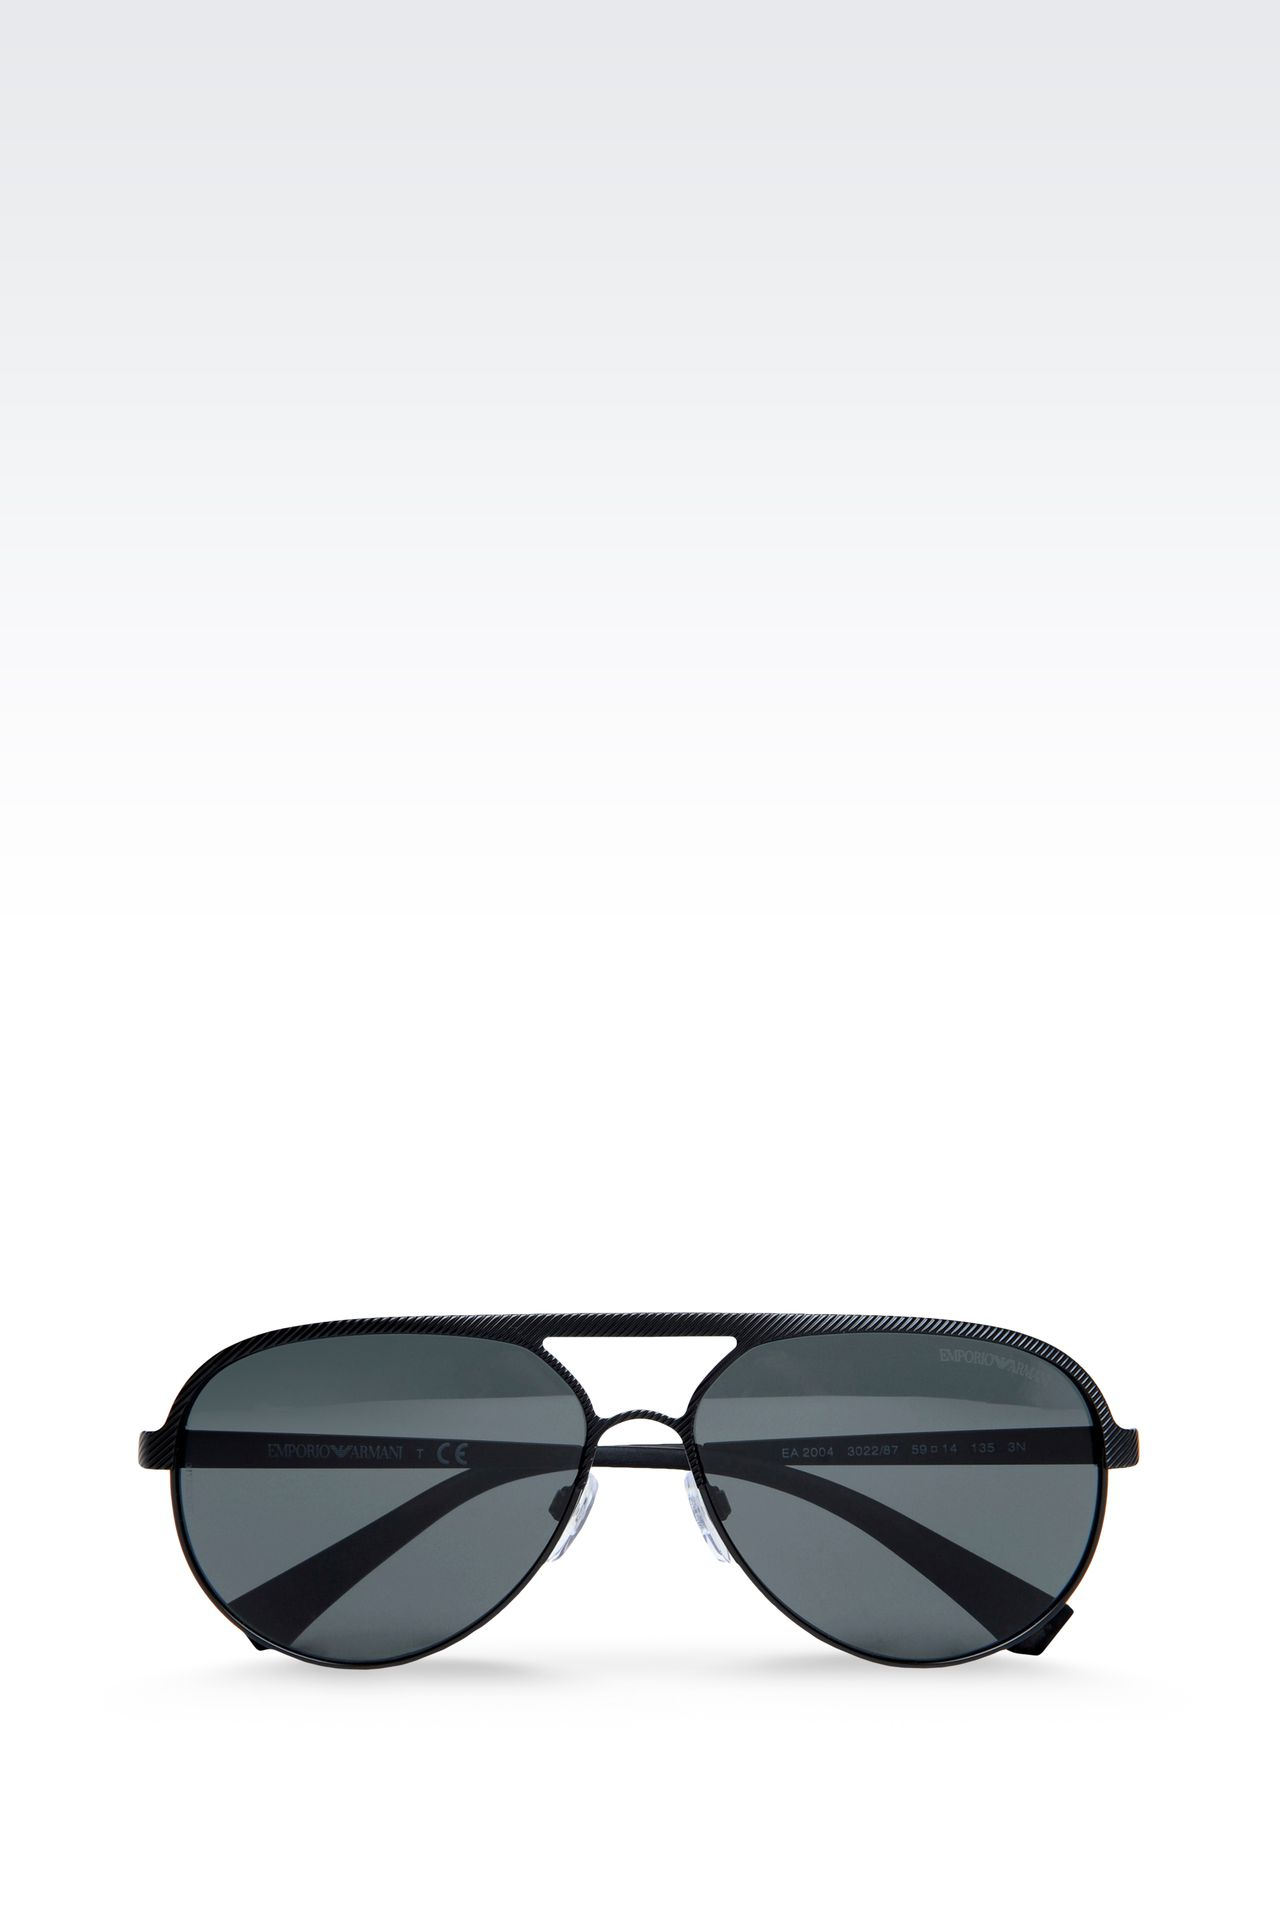 best place to buy sunglasses online  men sunglasses